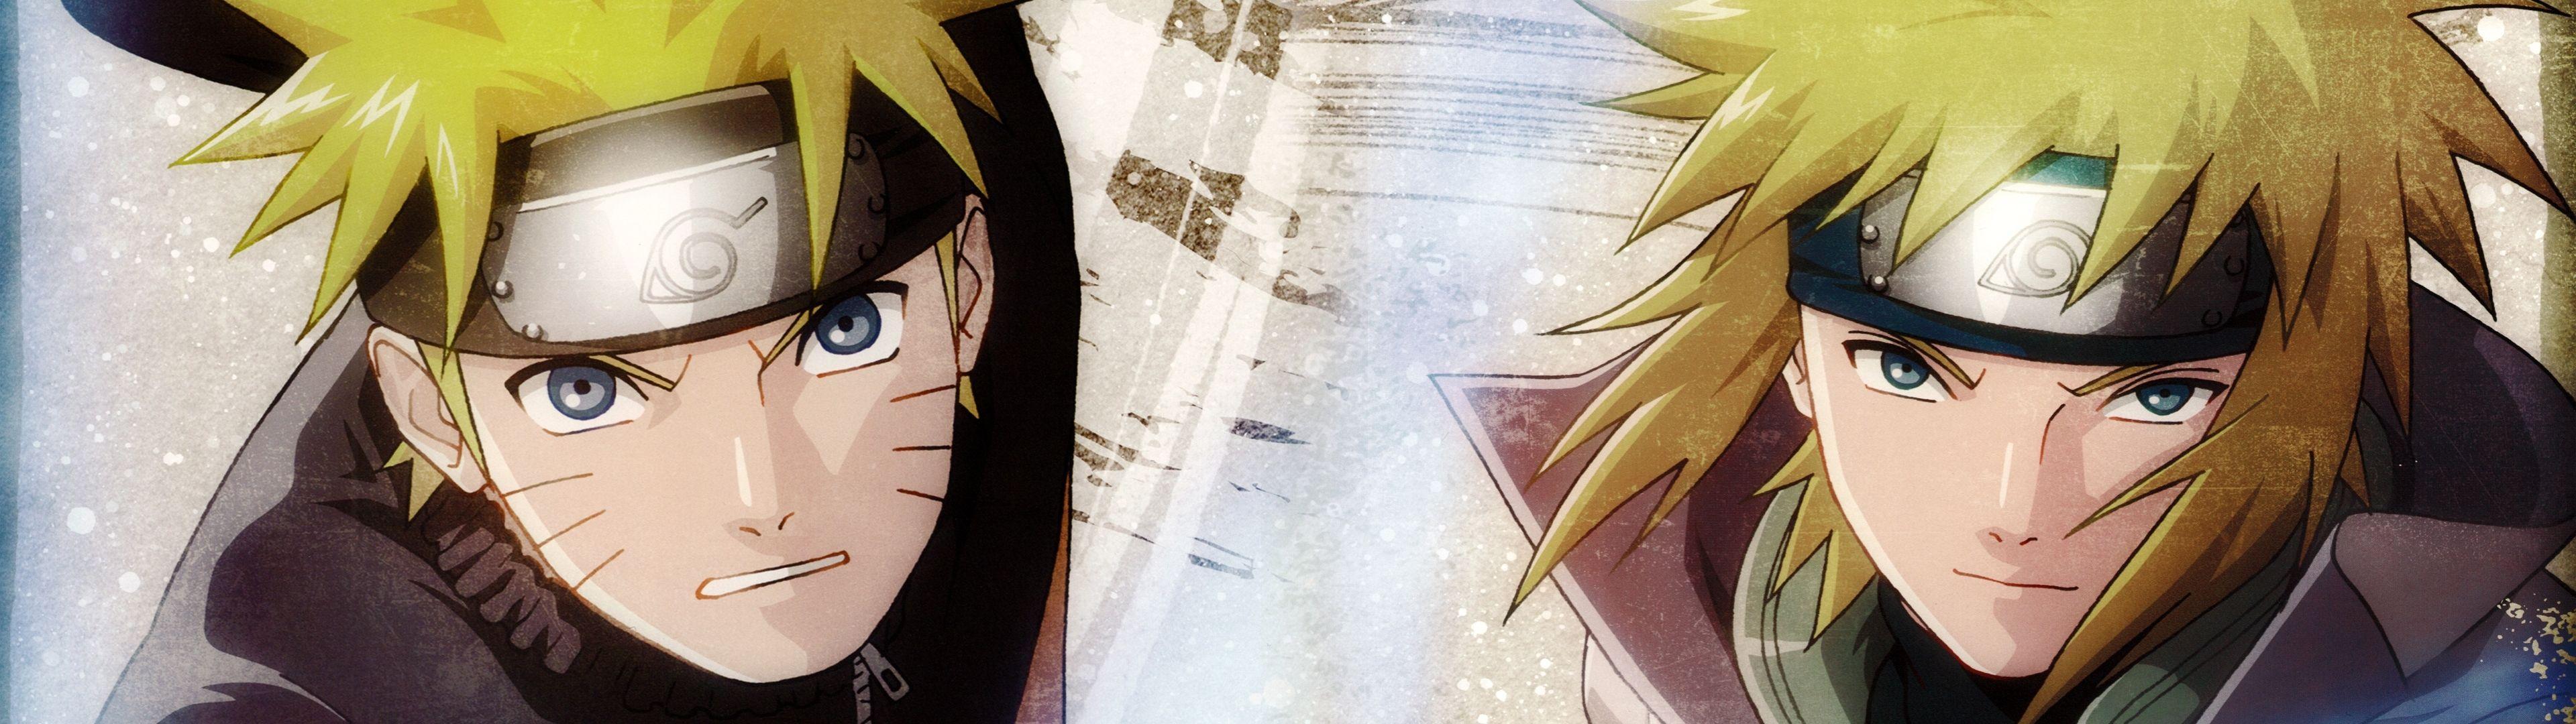 Naruto 3840x1080 Wallpapers Top Free Naruto 3840x1080 Backgrounds Wallpaperaccess